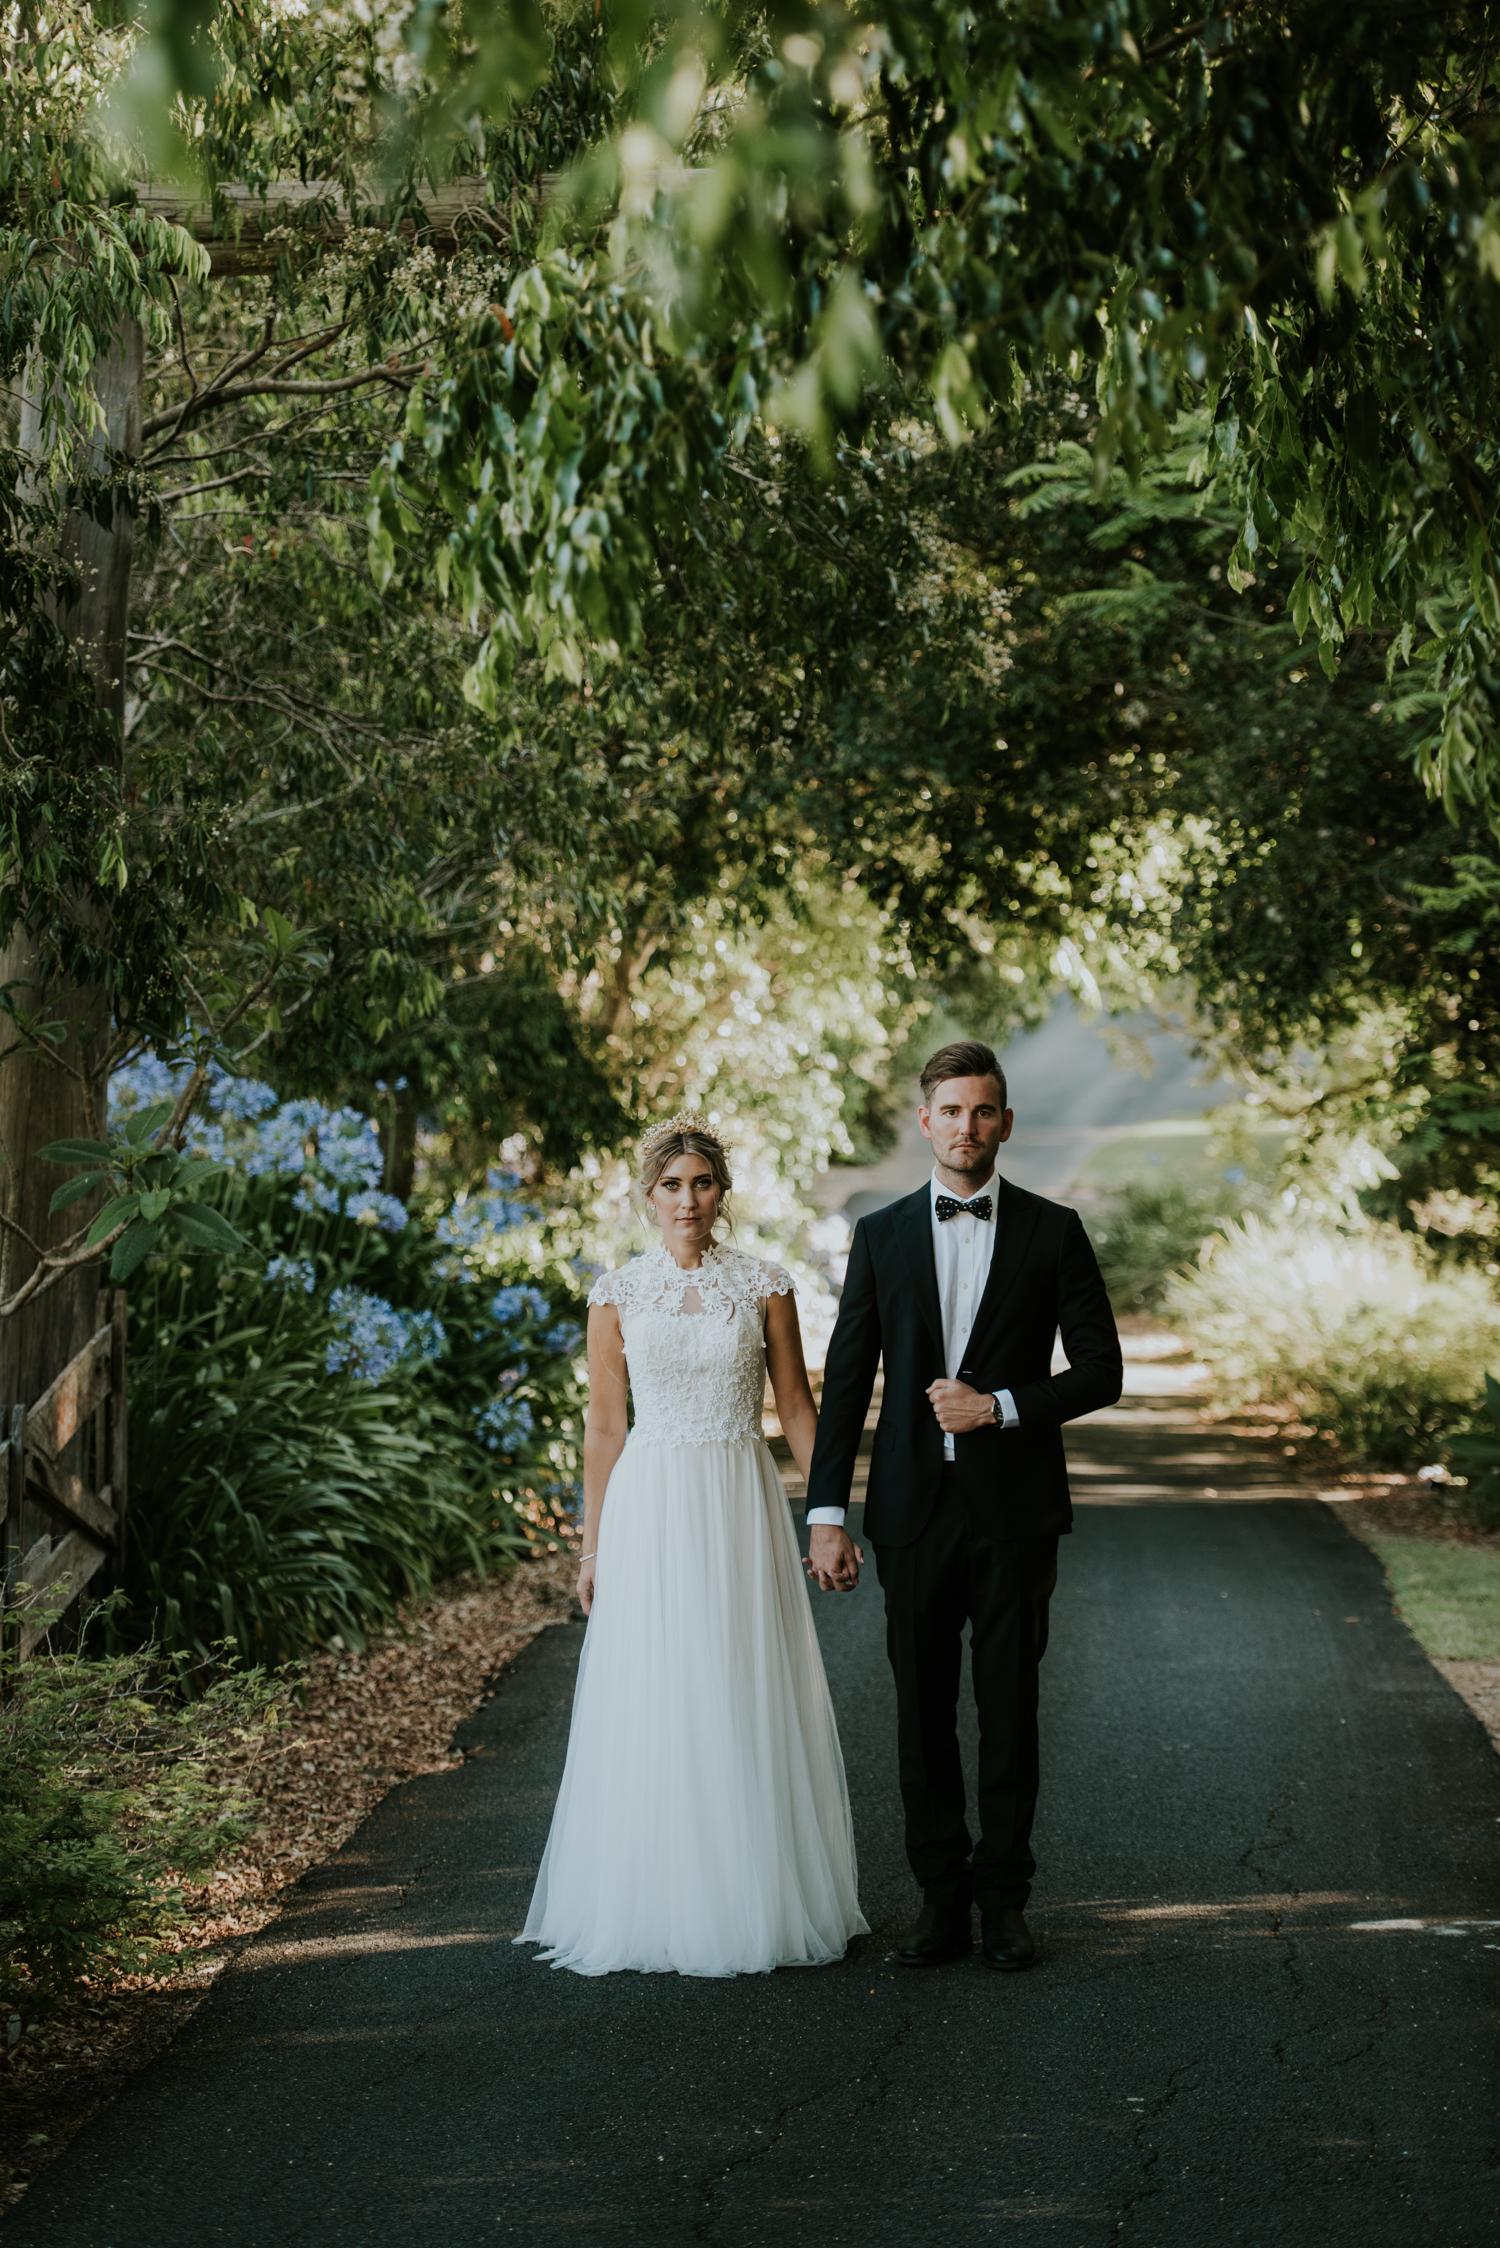 Byron Bay Wedding Photographer | Engagement-Elopement Photography-53.jpg